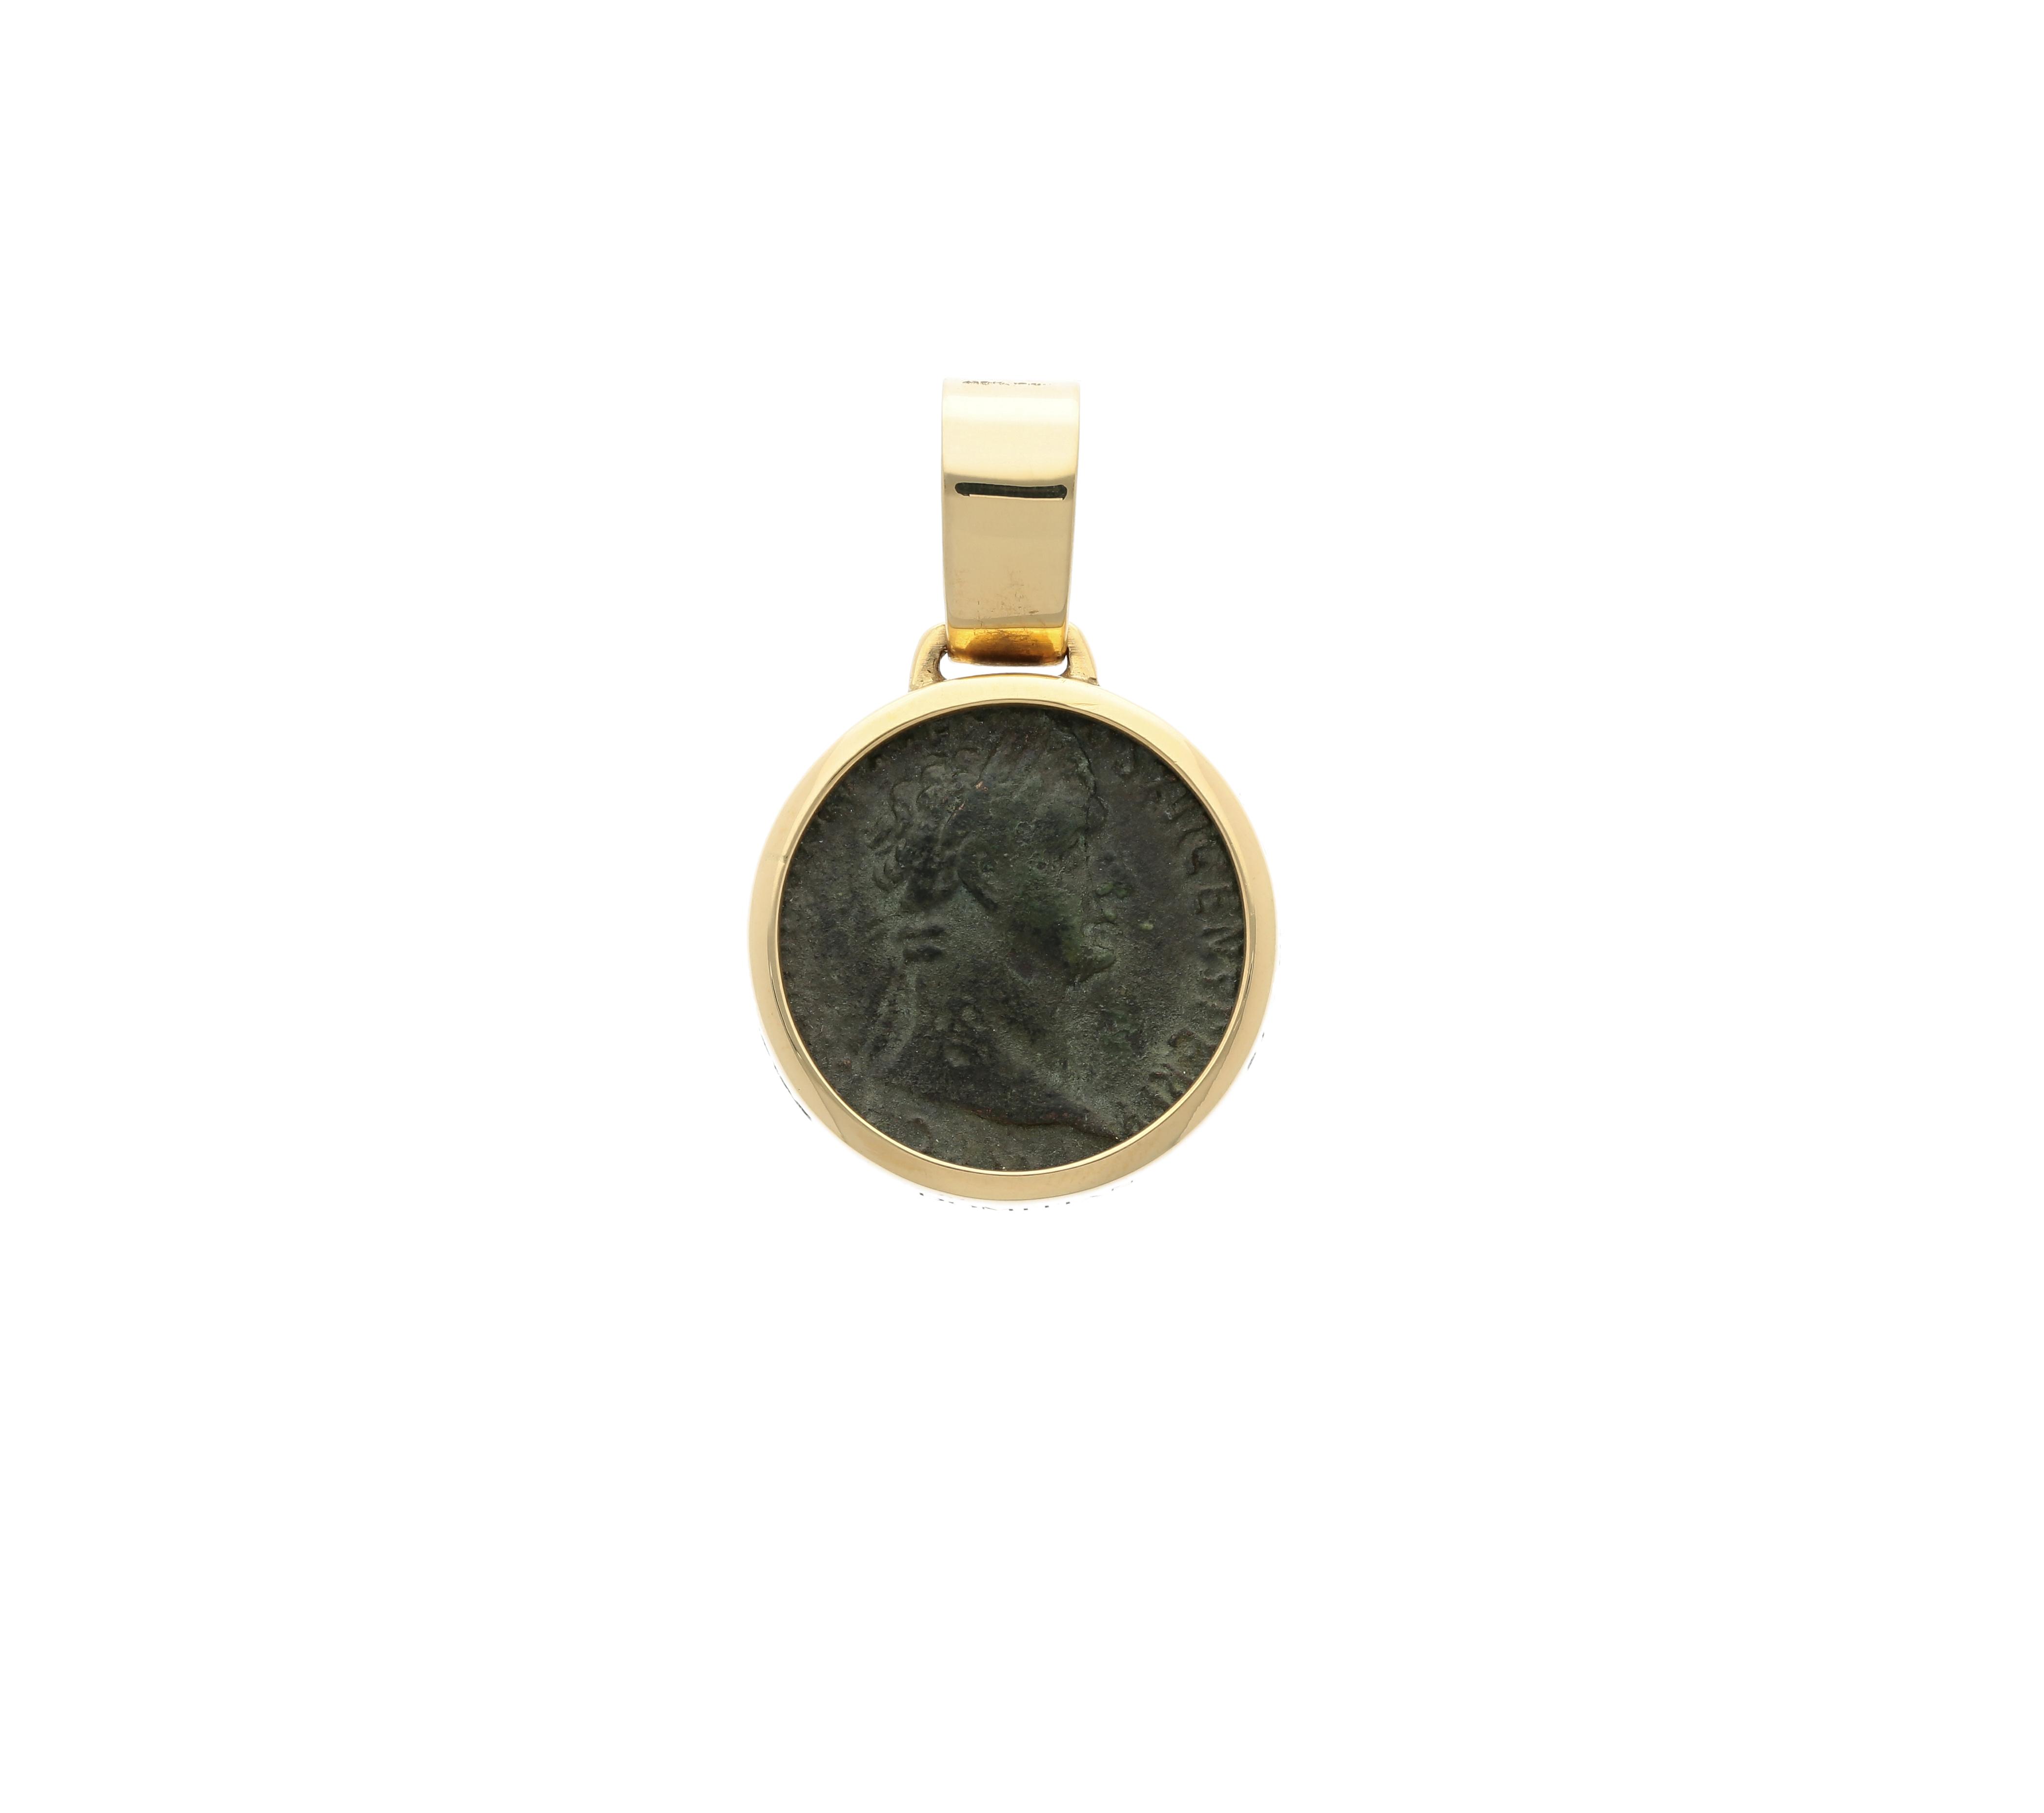 Emperor Domitian Roman Coin Bronze denarius, frame 18kt gold